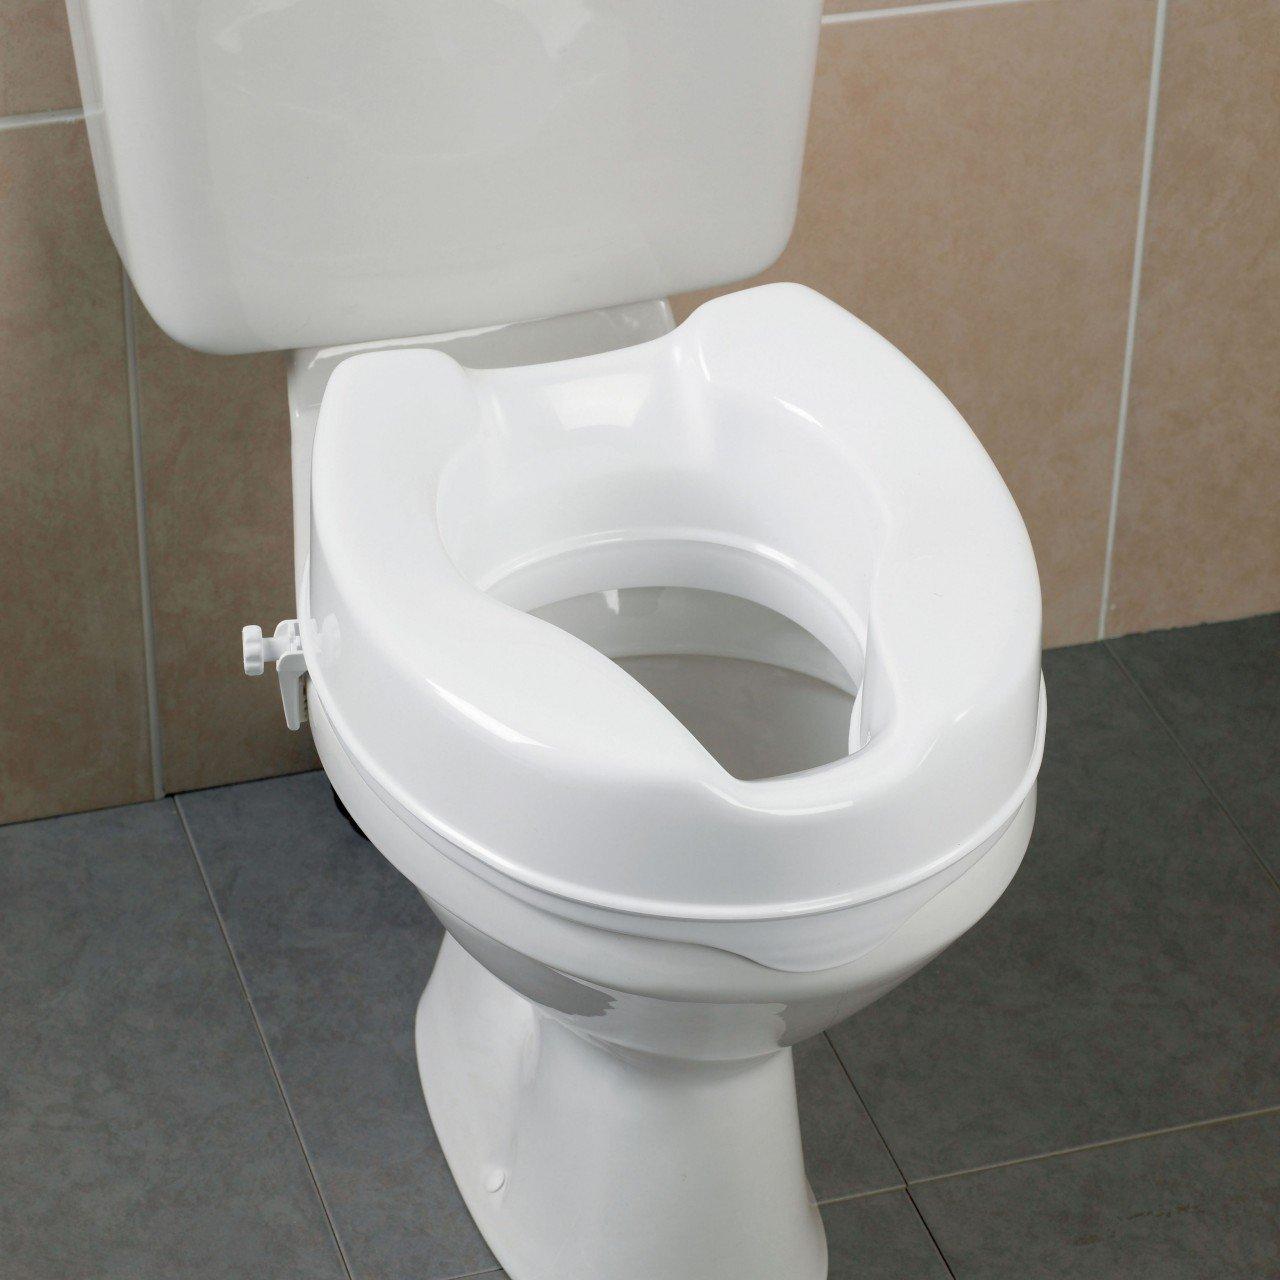 Amazon.com: Raised Toilet Seat by HEALTHLINE, Elevated Hinged Toilet ...